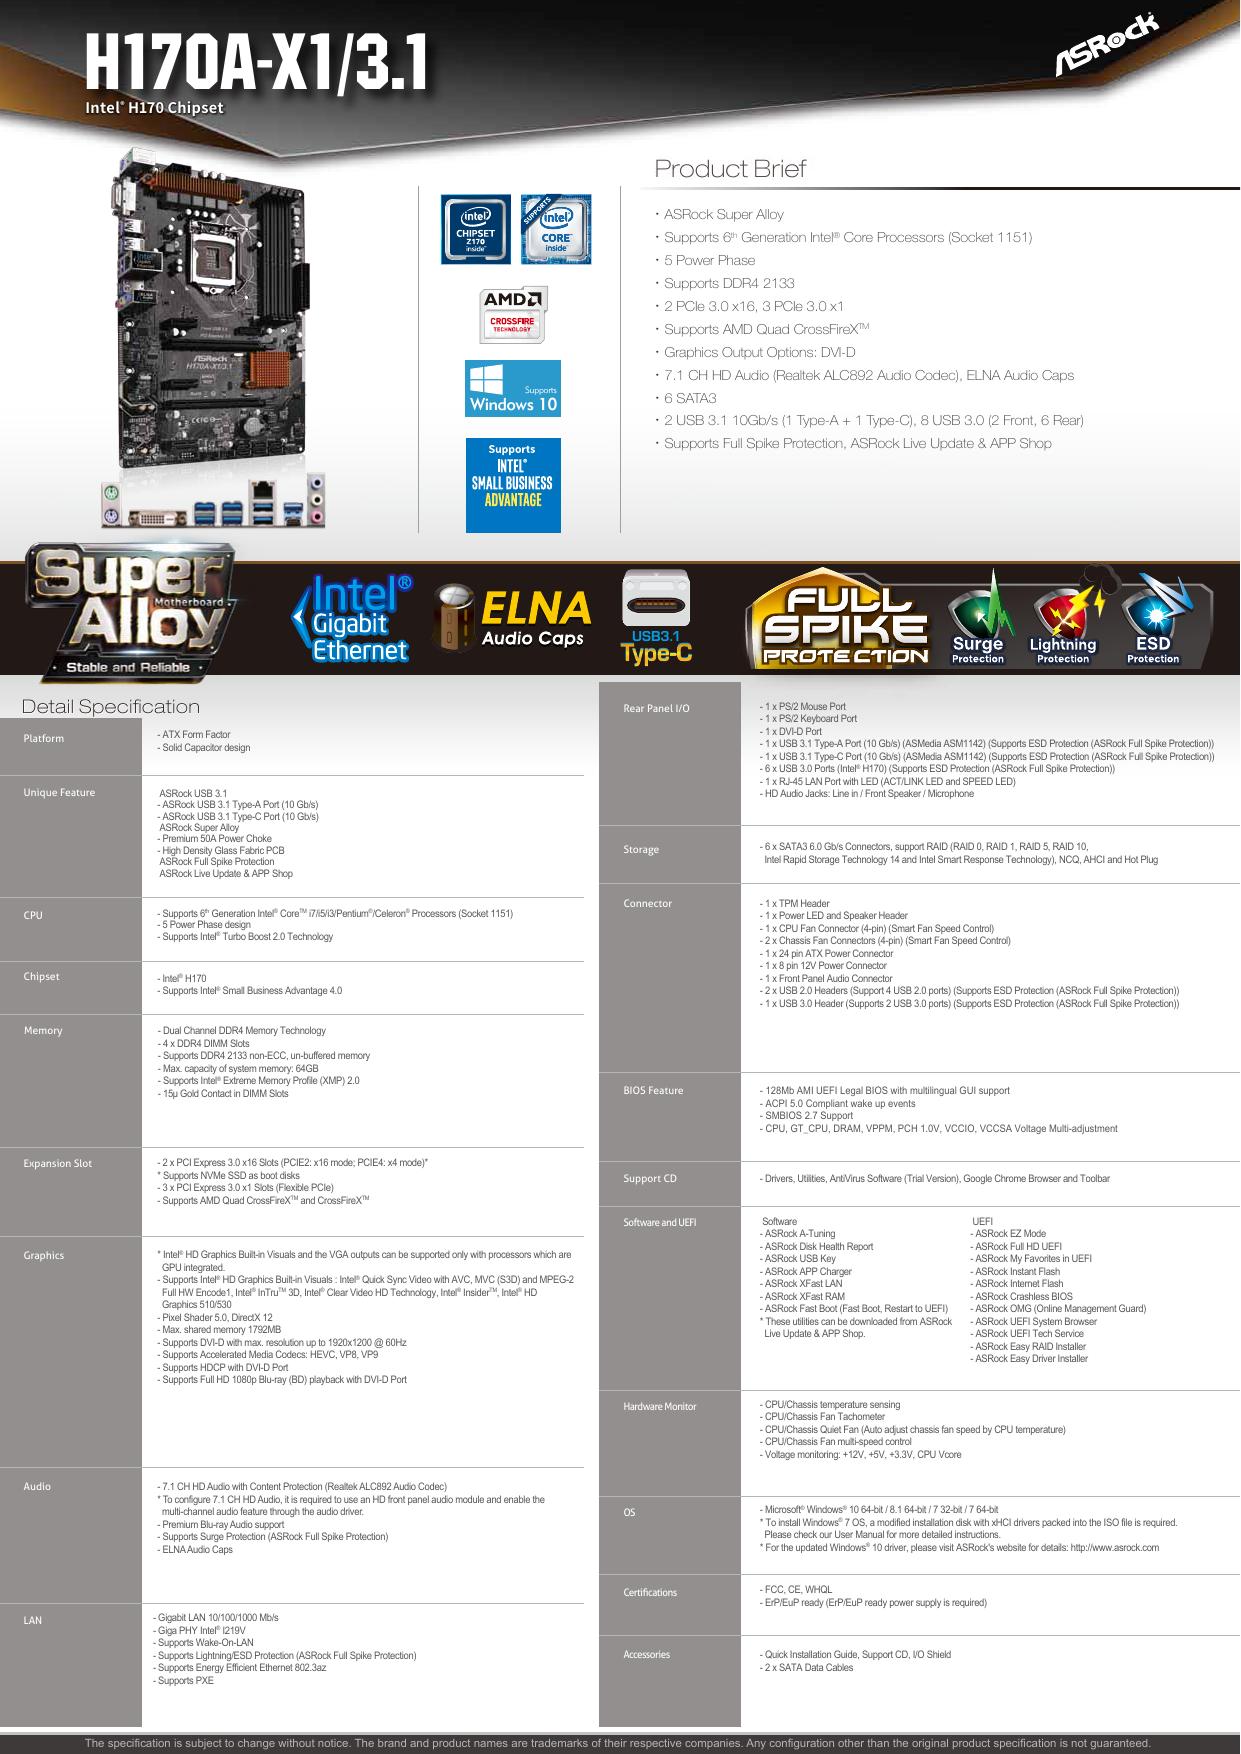 H170A-X1/3 1 - many Electronics | manualzz com